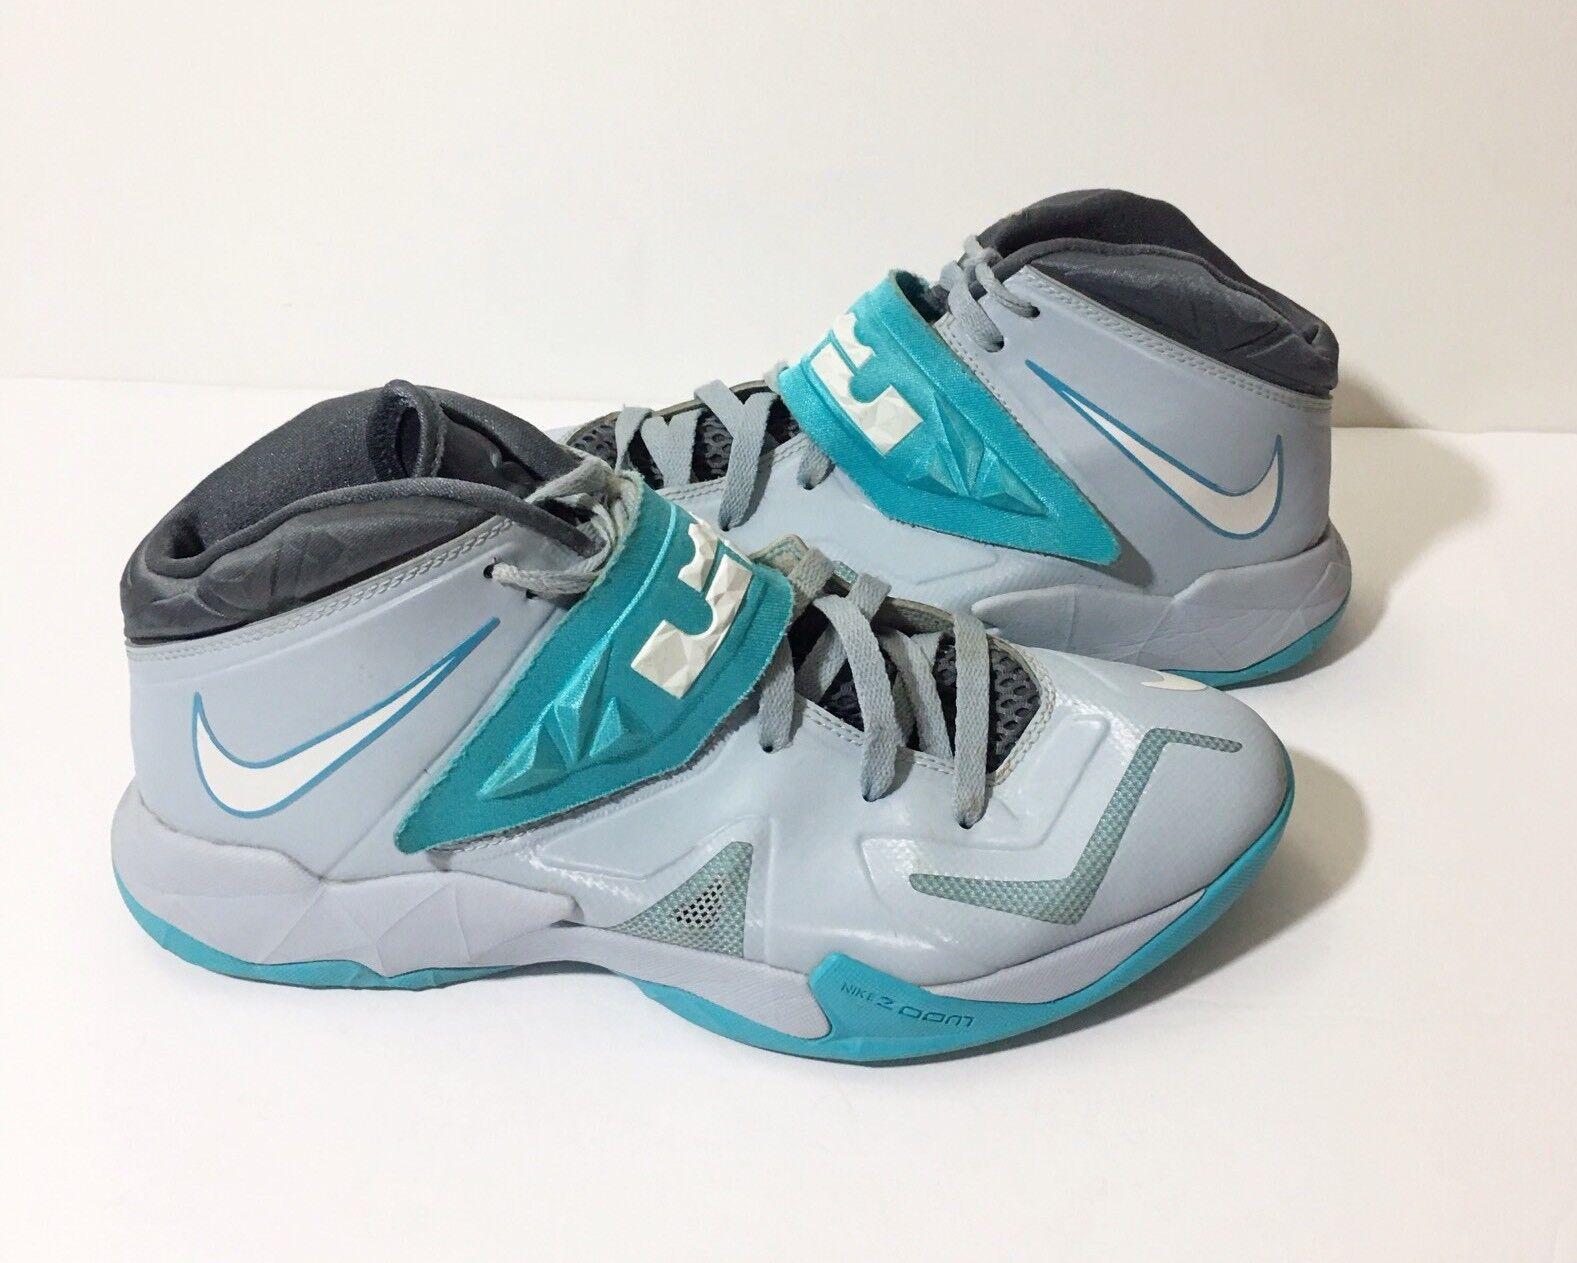 best website 37f96 77a87 Nike 13 Lebron Lebron Lebron Zoom Soldier Sneaker 7 VII 2013 Light Armory  Blue 599264-402  130 e798ea